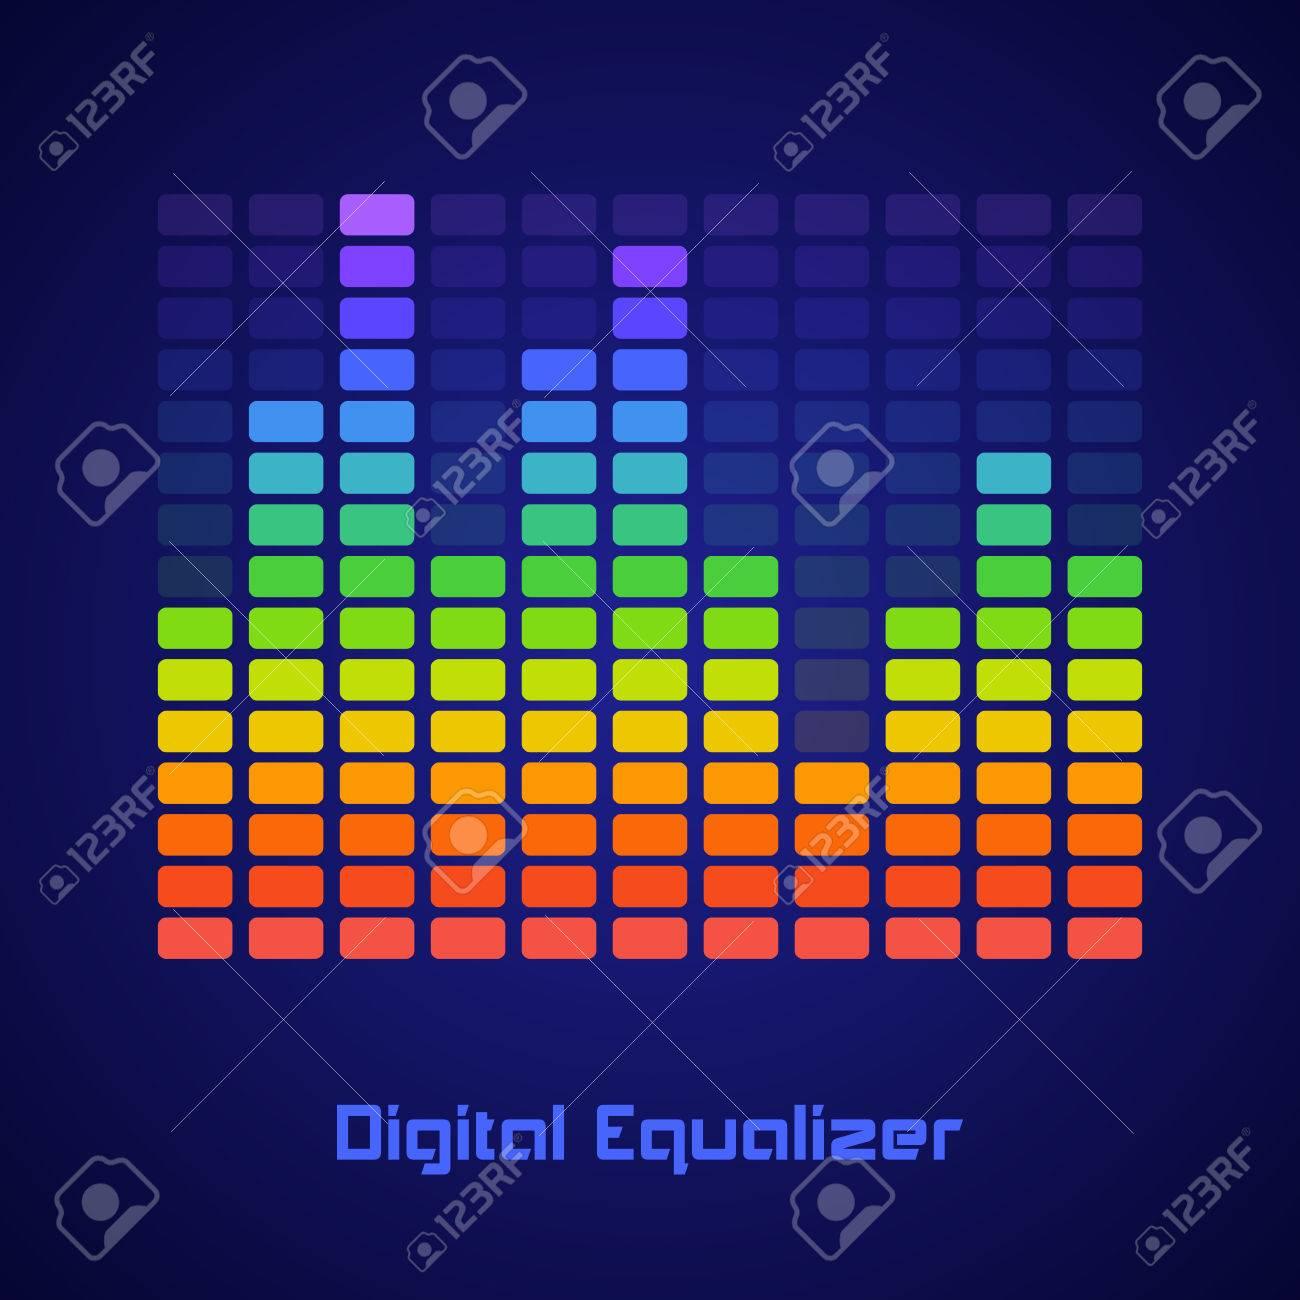 Rainbow Equalizer on dark background. Vector illustration Stock Vector - 24895870